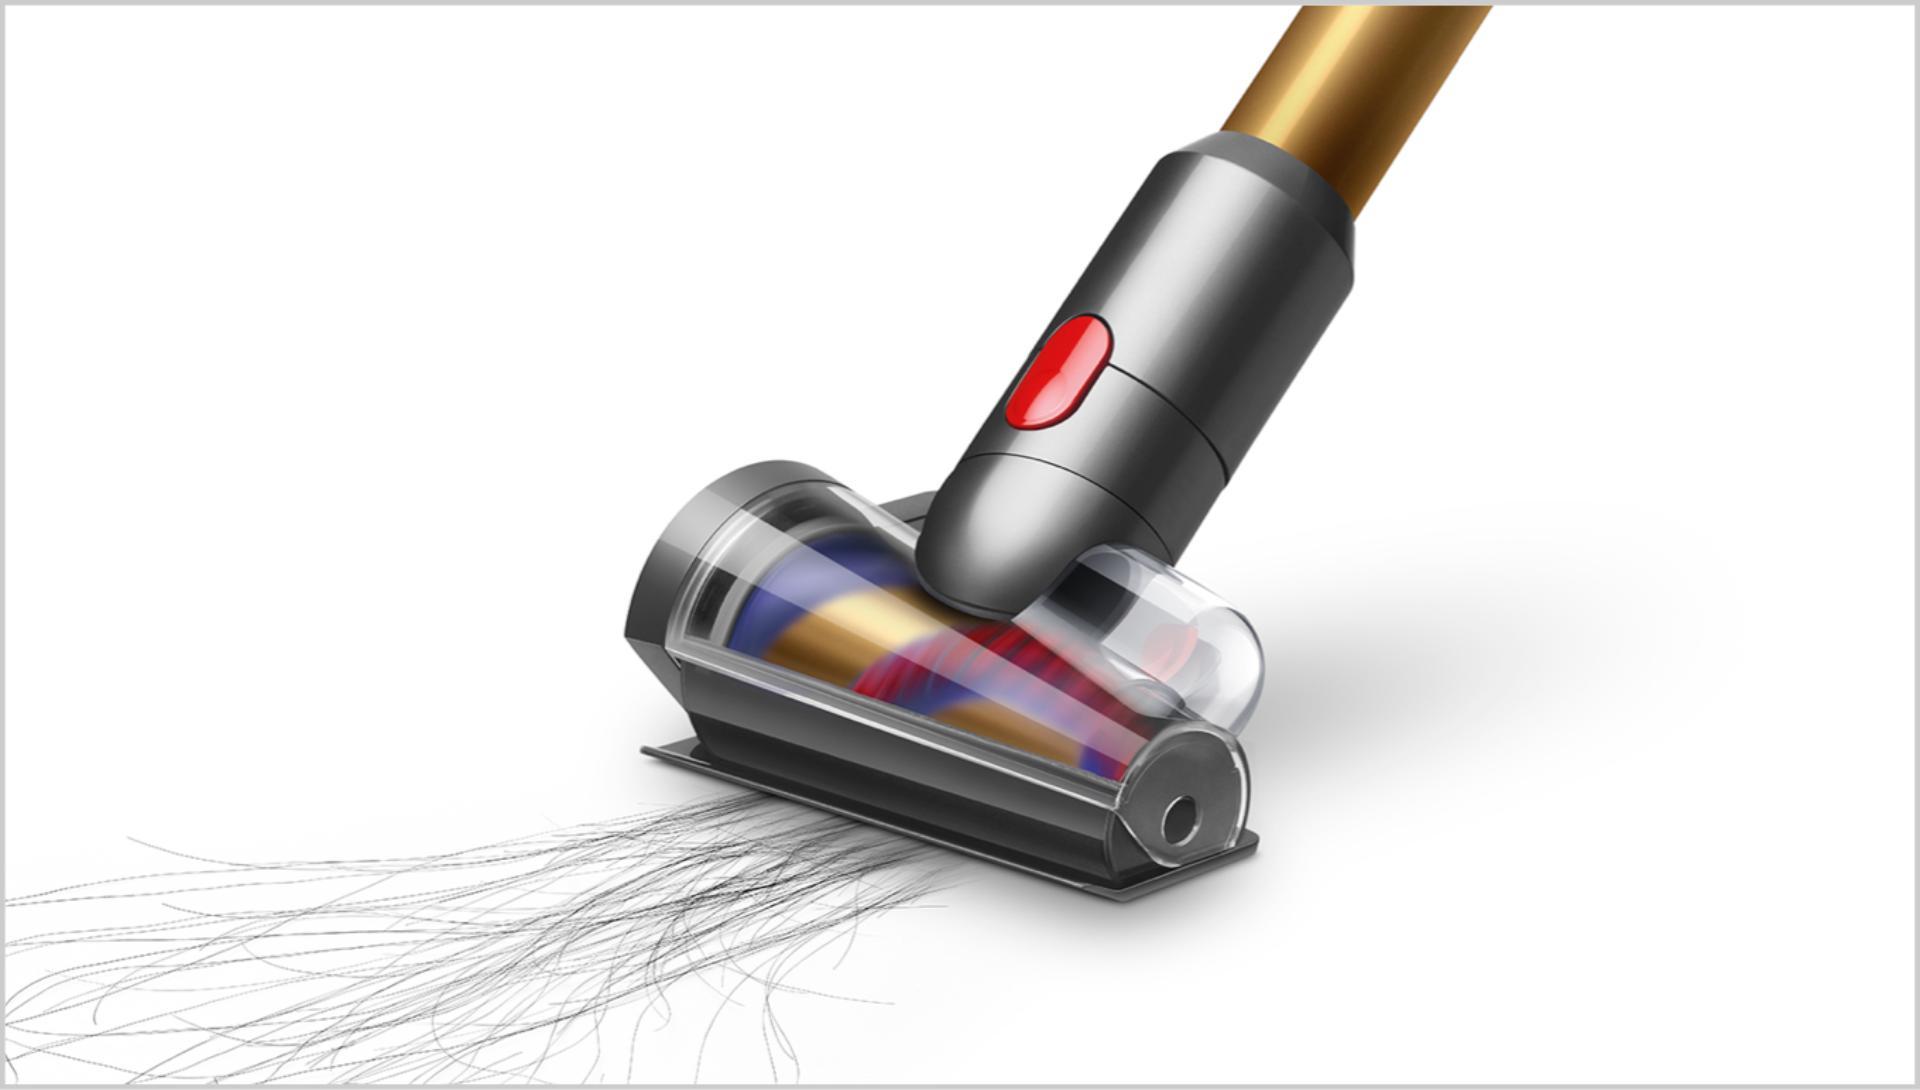 Hair screw tool sucking up long hair